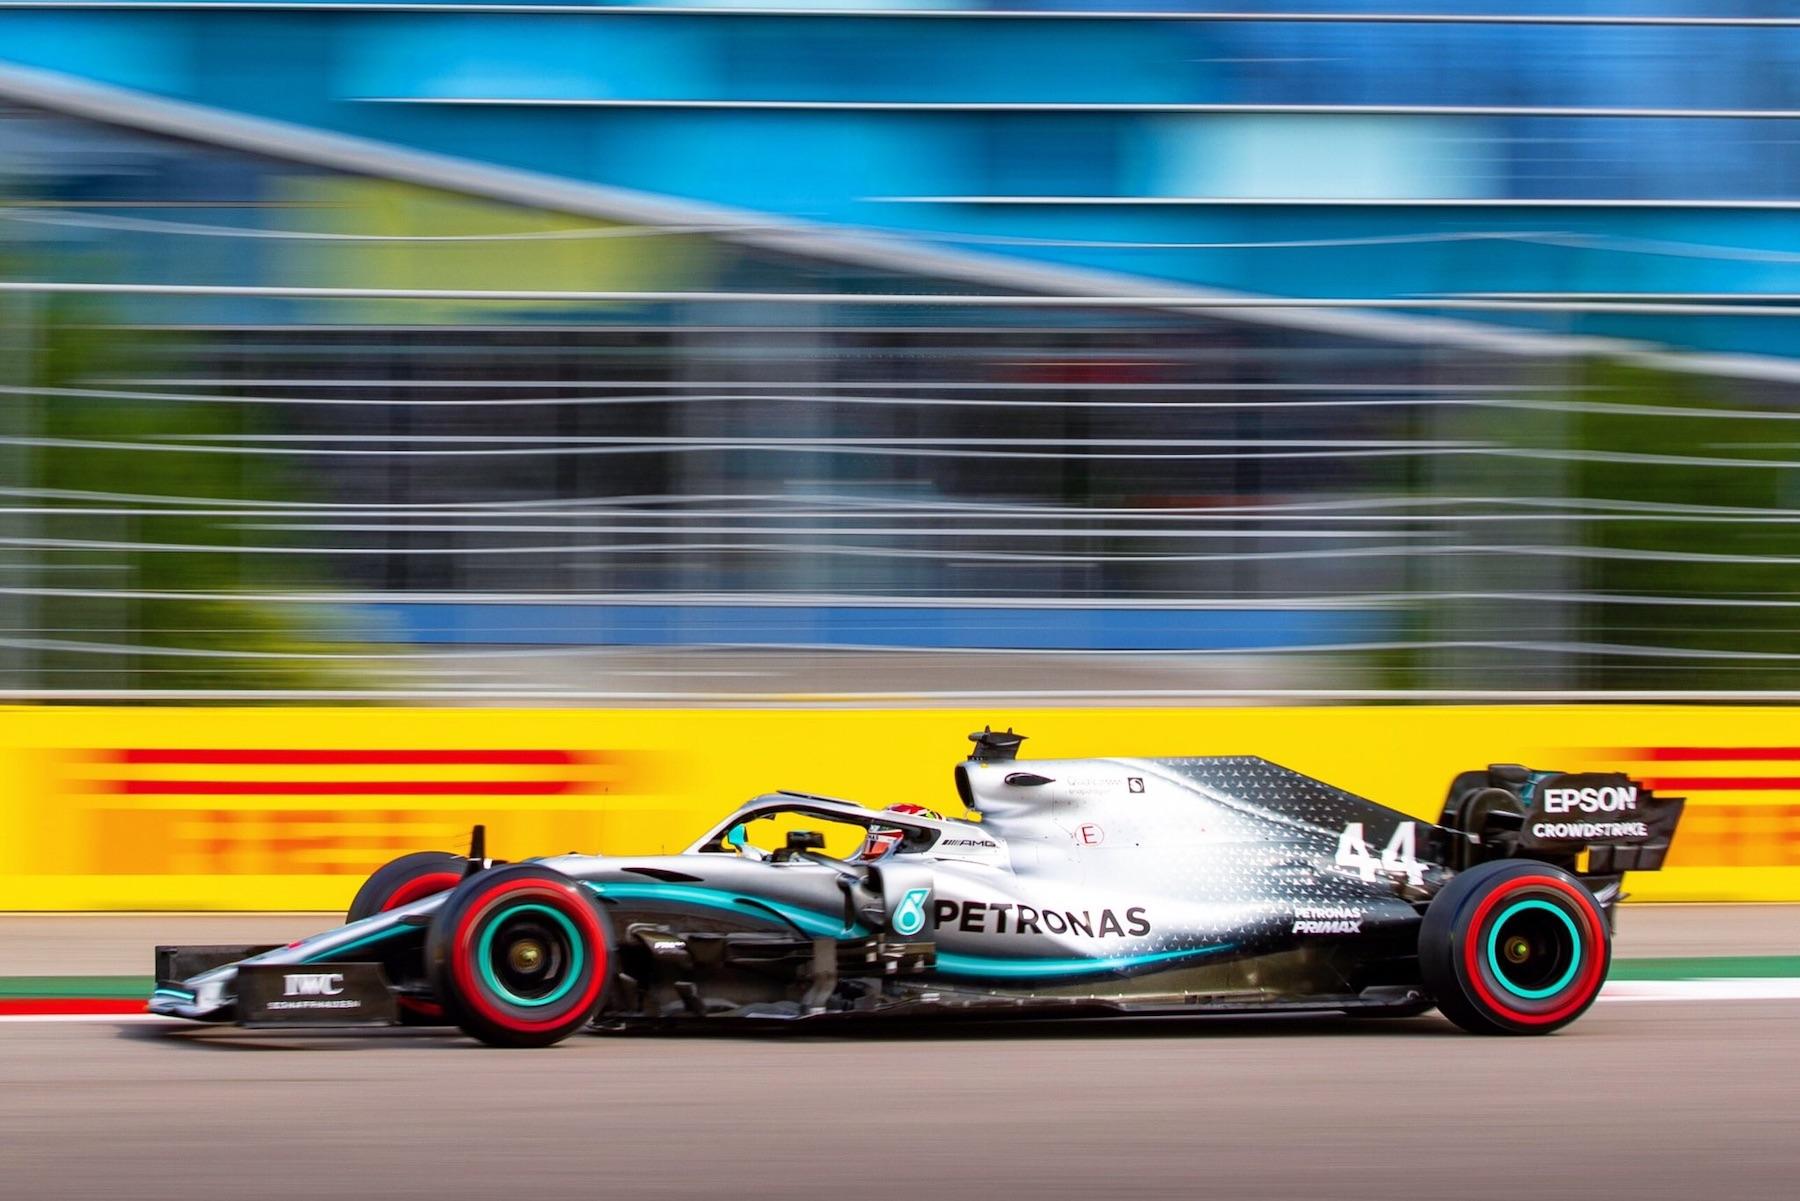 3 2019 Russian GP Saturday 16.jpg